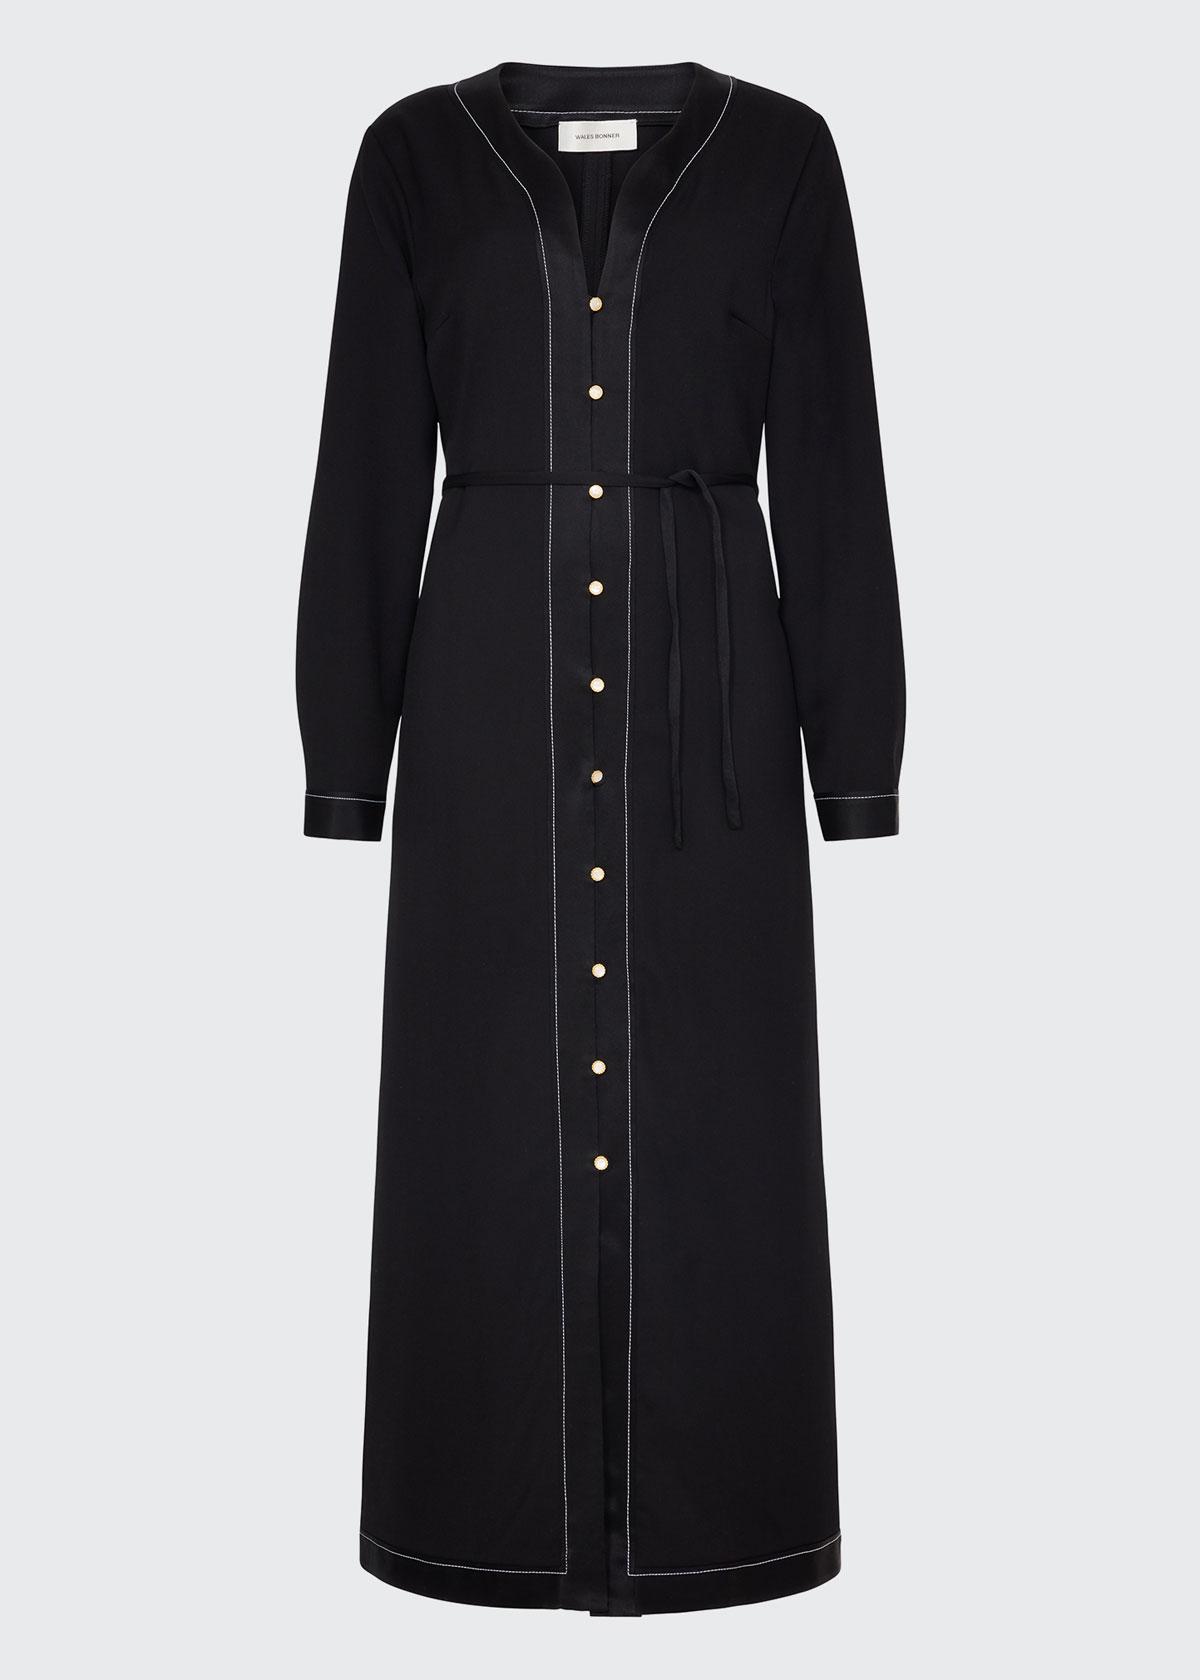 Wales Bonner Robes WOOL CAFTAN DRESS